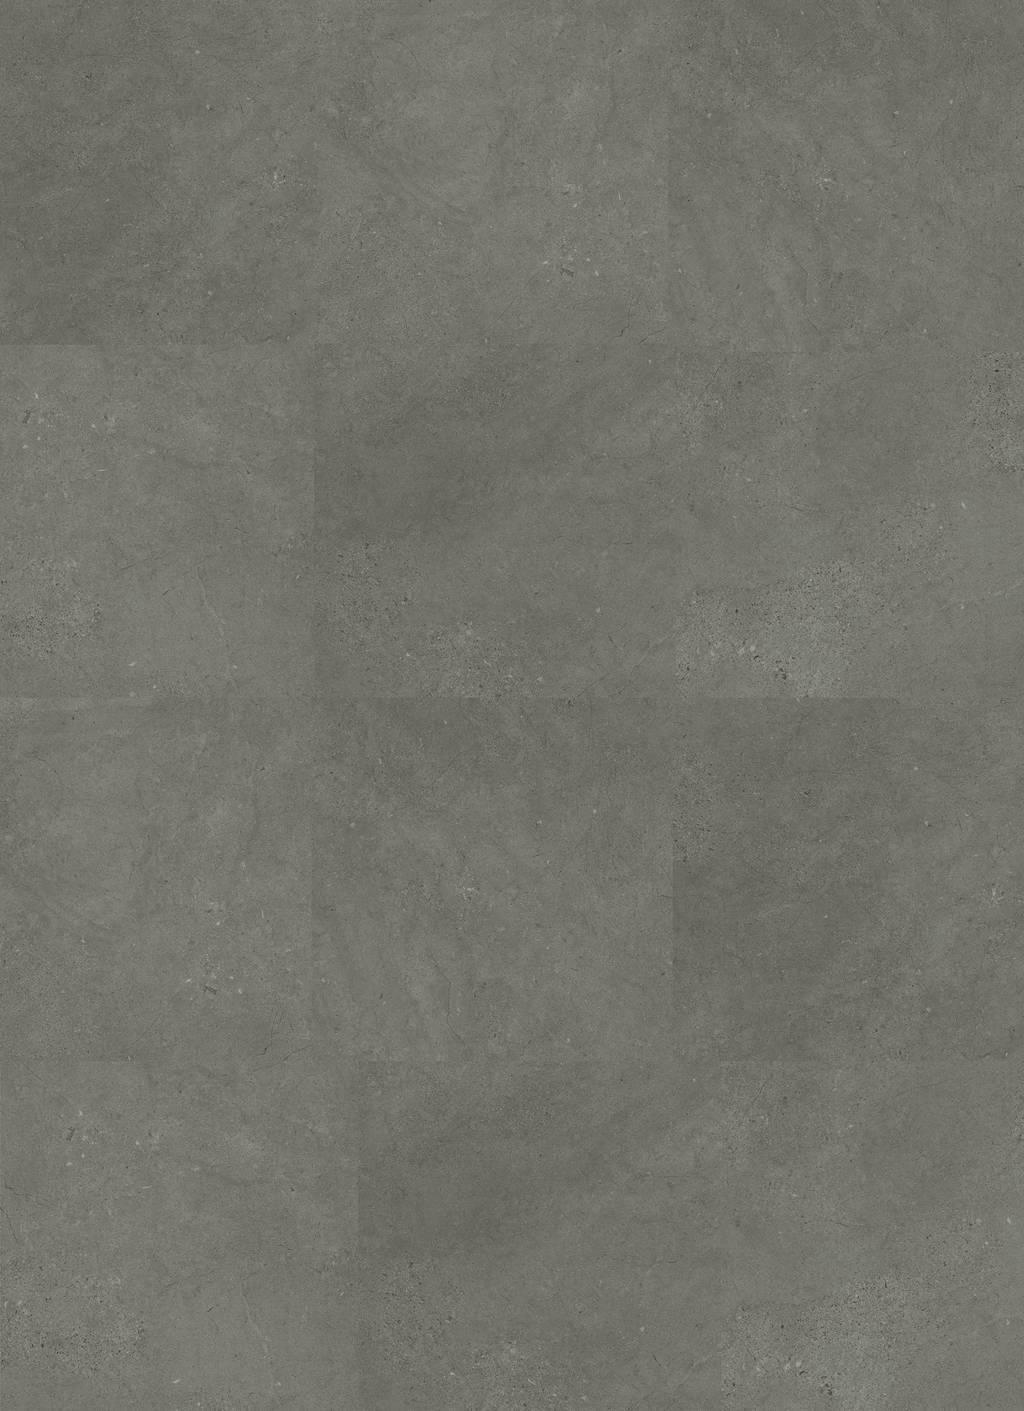 JOKA / INKU Designboden 2845 (Dark Concrete) Vinylboden